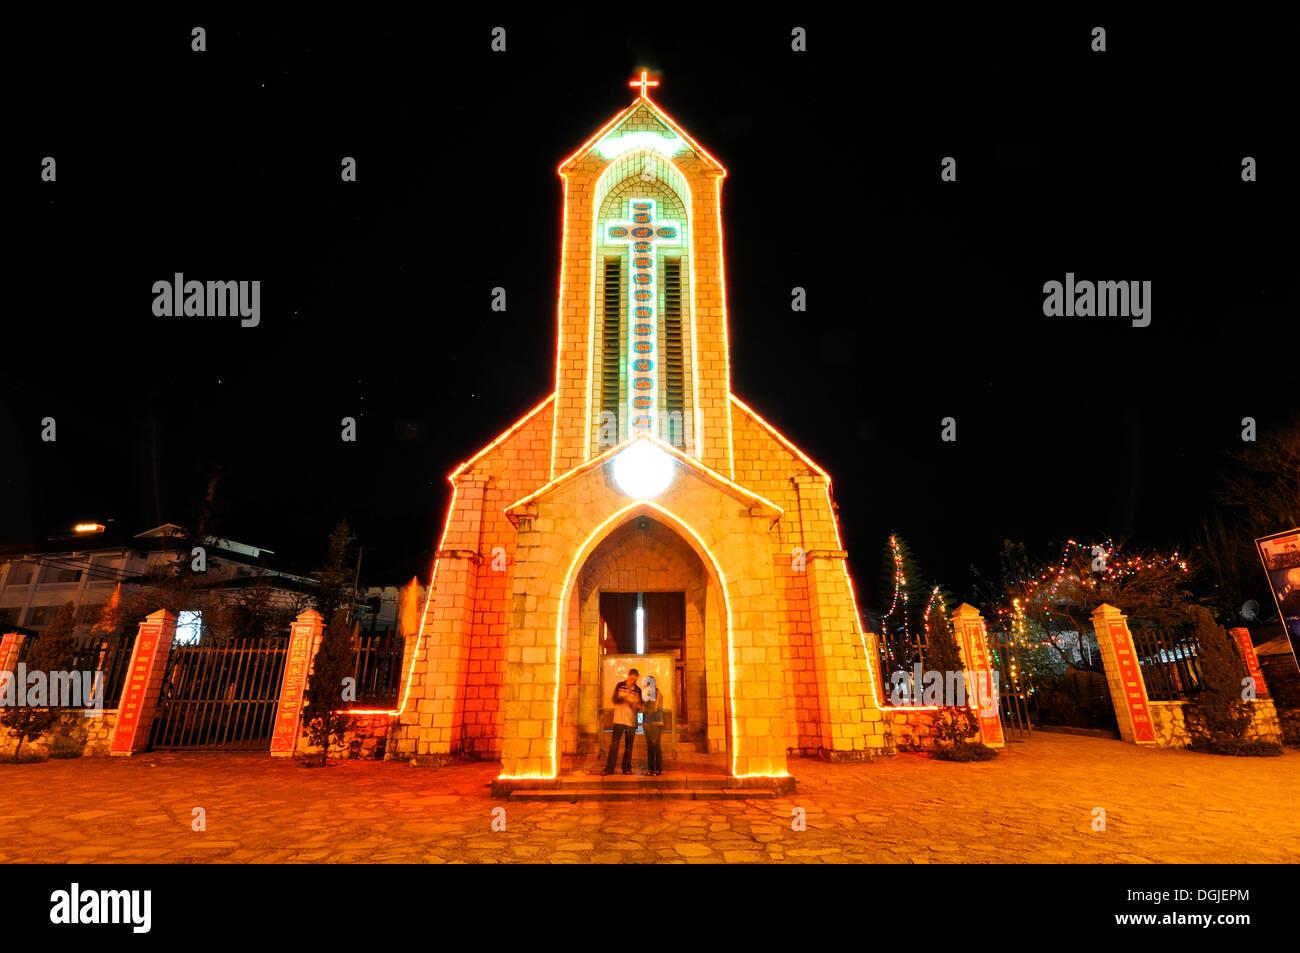 Famous French Church, Nha tho da Sa Pa, Thi tran Sapa, Sapa or Sa Pa, Lao Cai province, northern Vietnam, Vietnam - Stock Image